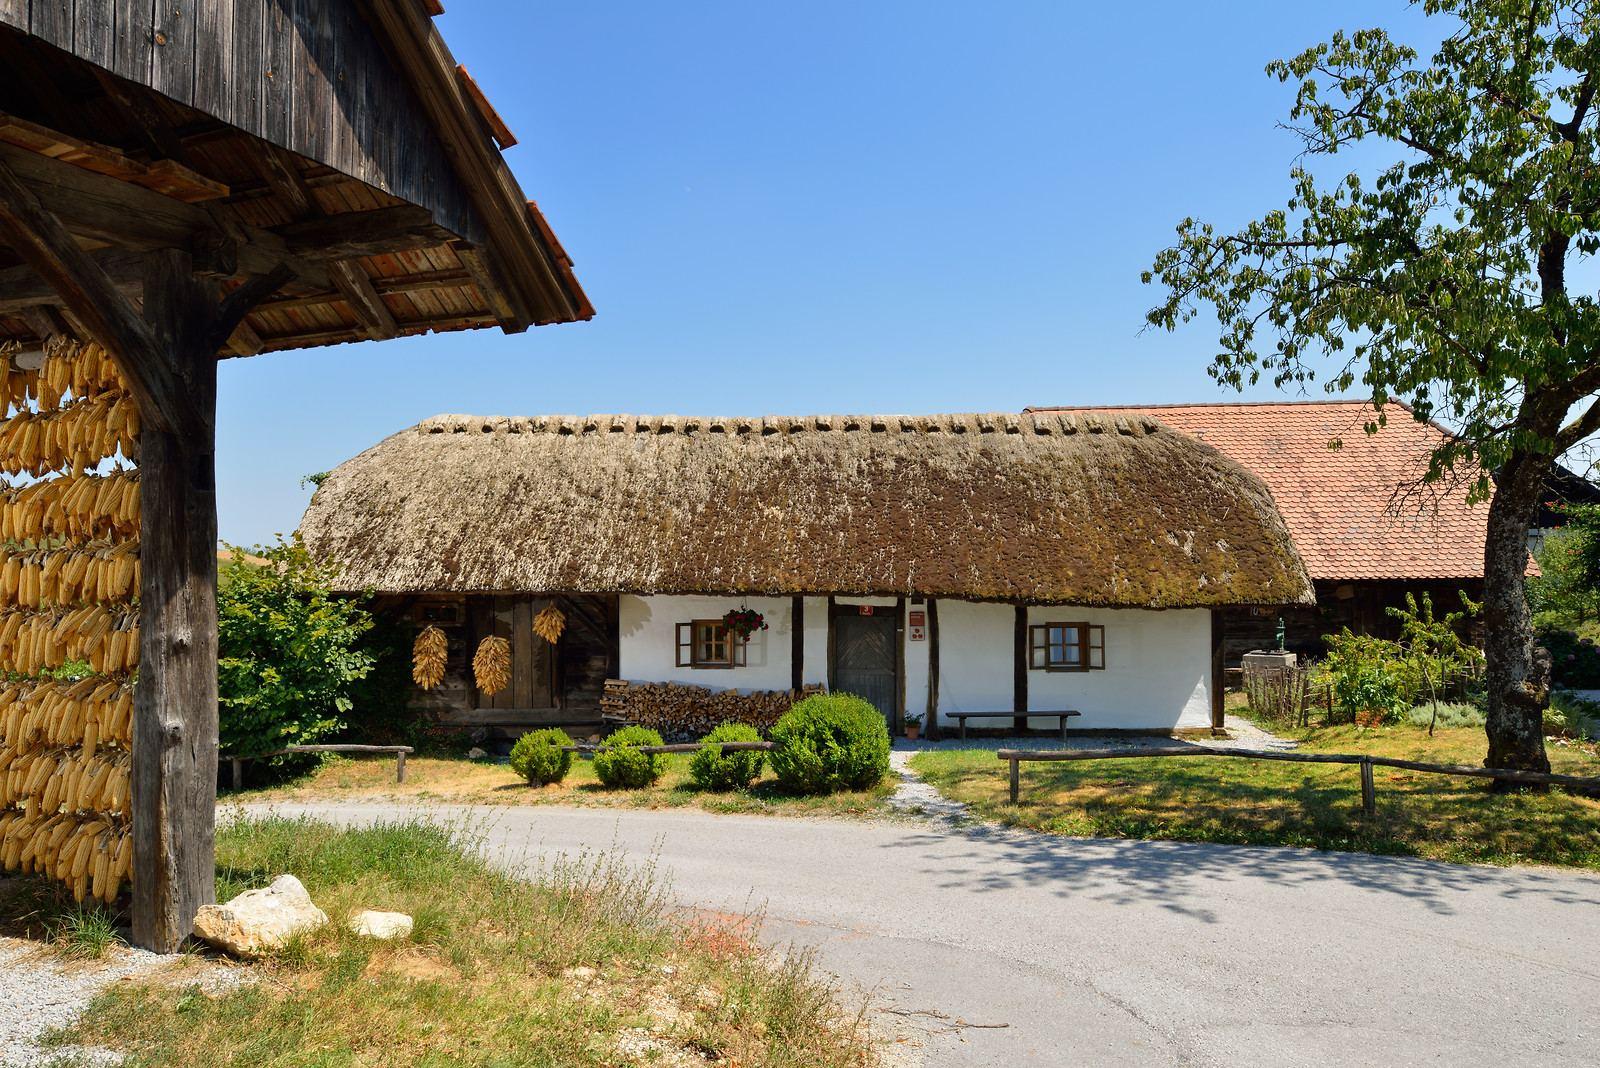 Matjaževa domačija, Slovinsko. Foto: Miran Kambic